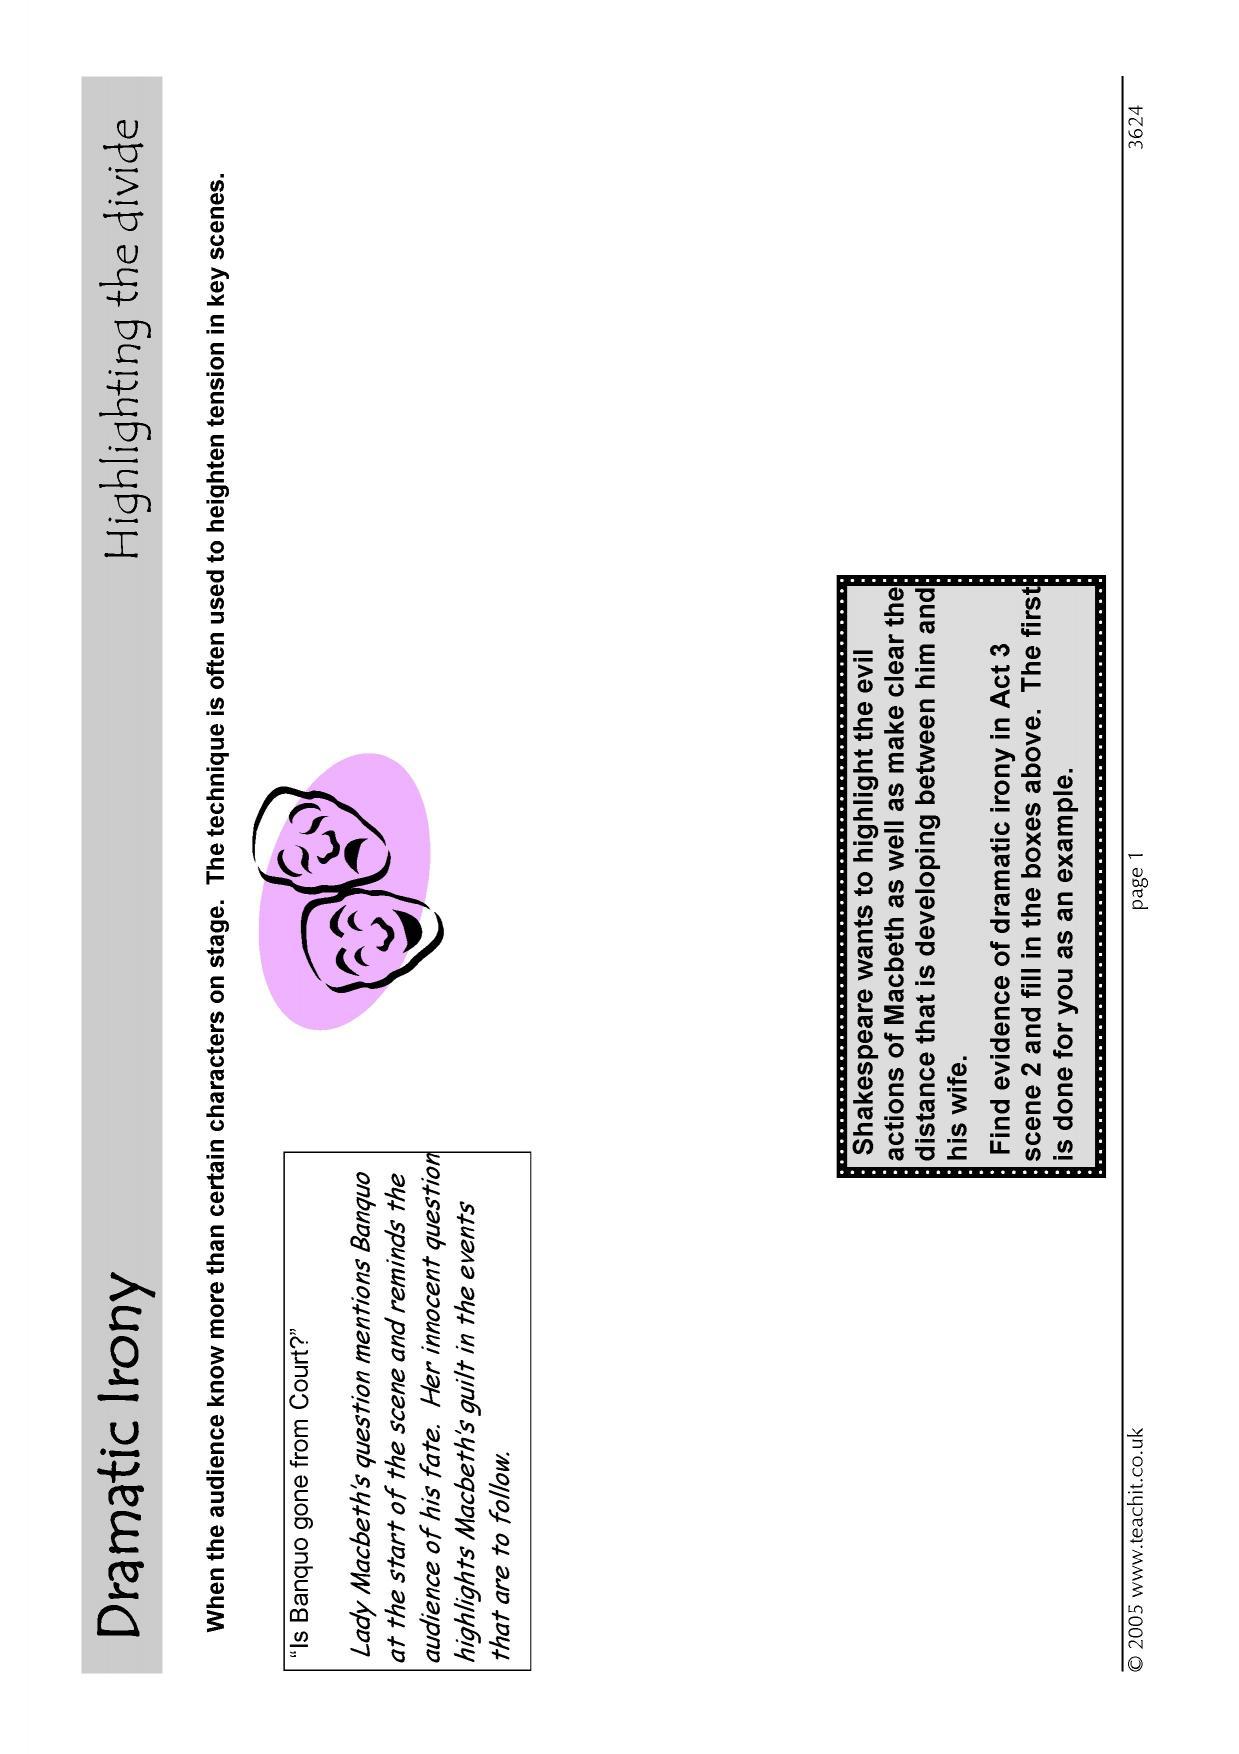 Ks4 macbeth act 3 teachit english 0 preview buycottarizona